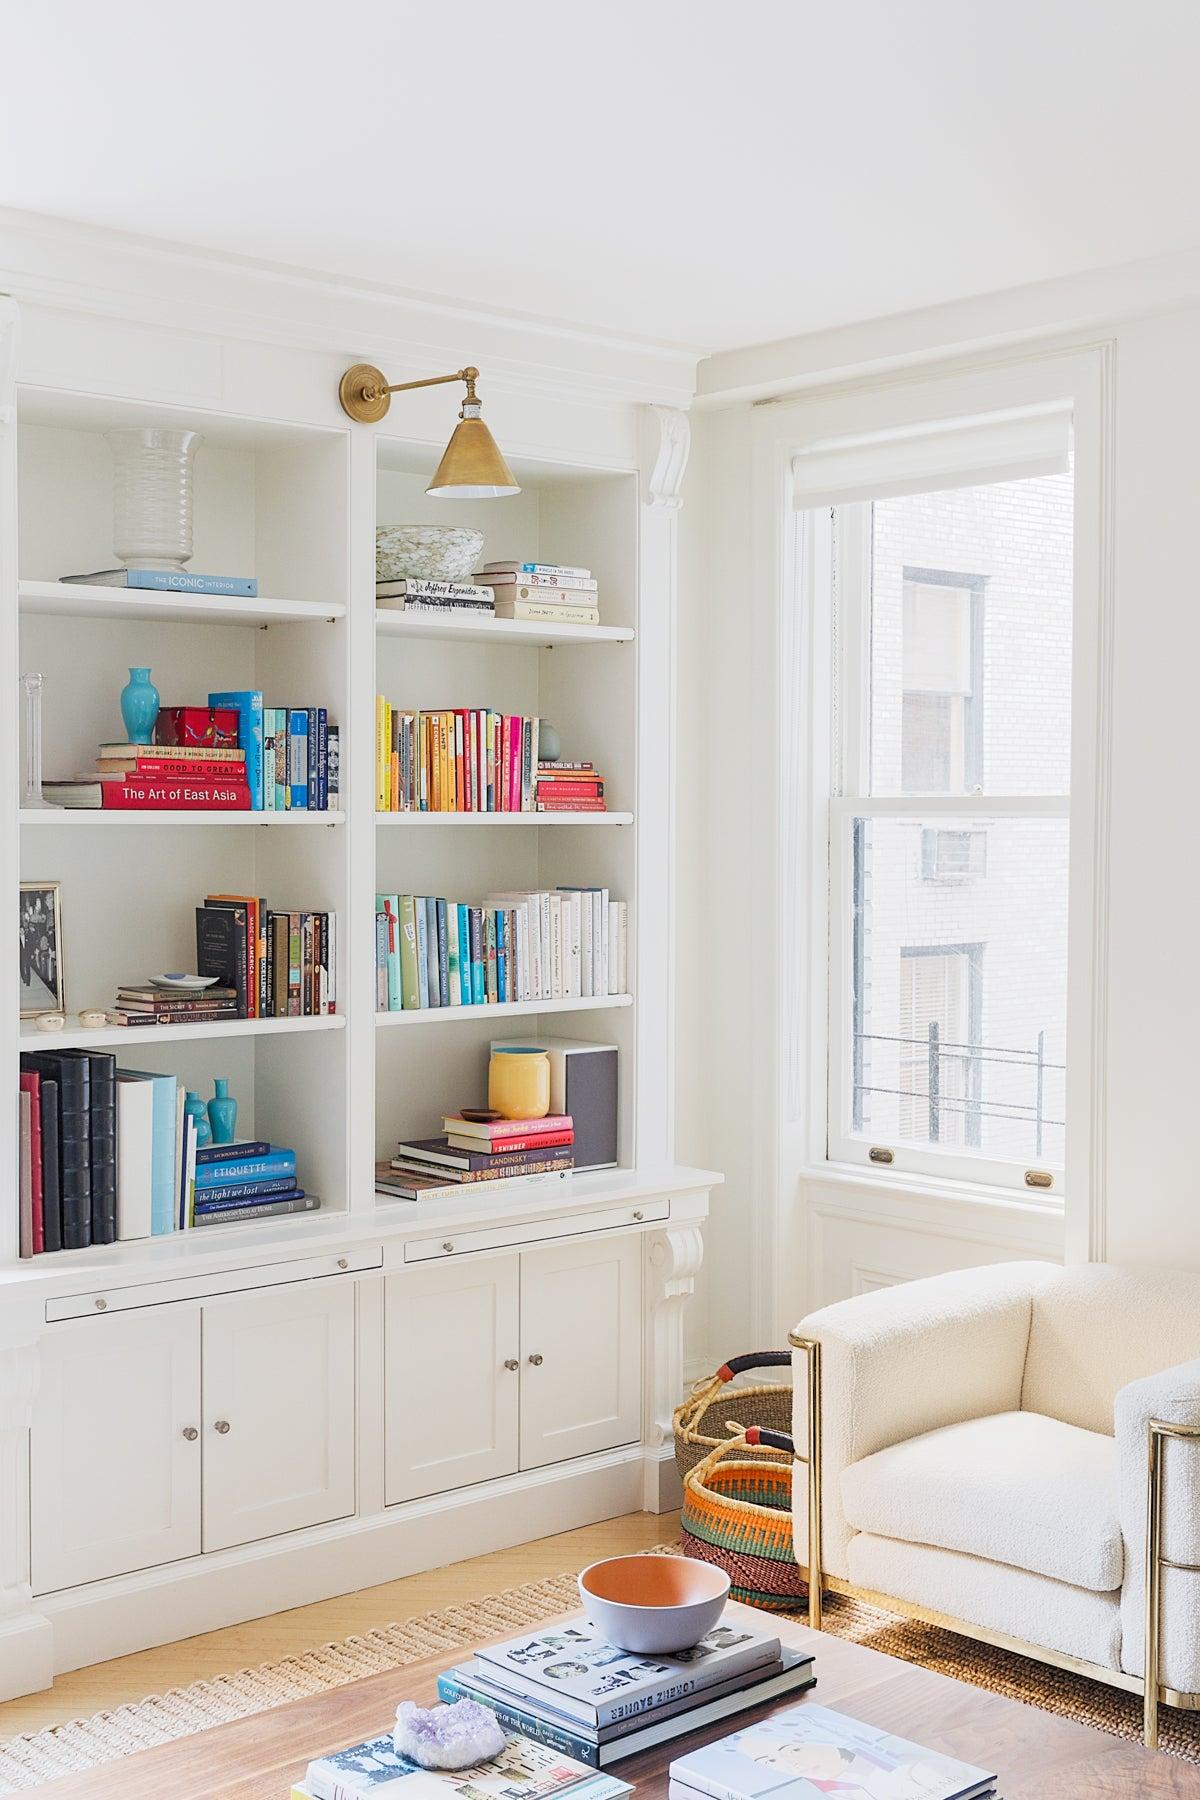 White apartment with bookshelves